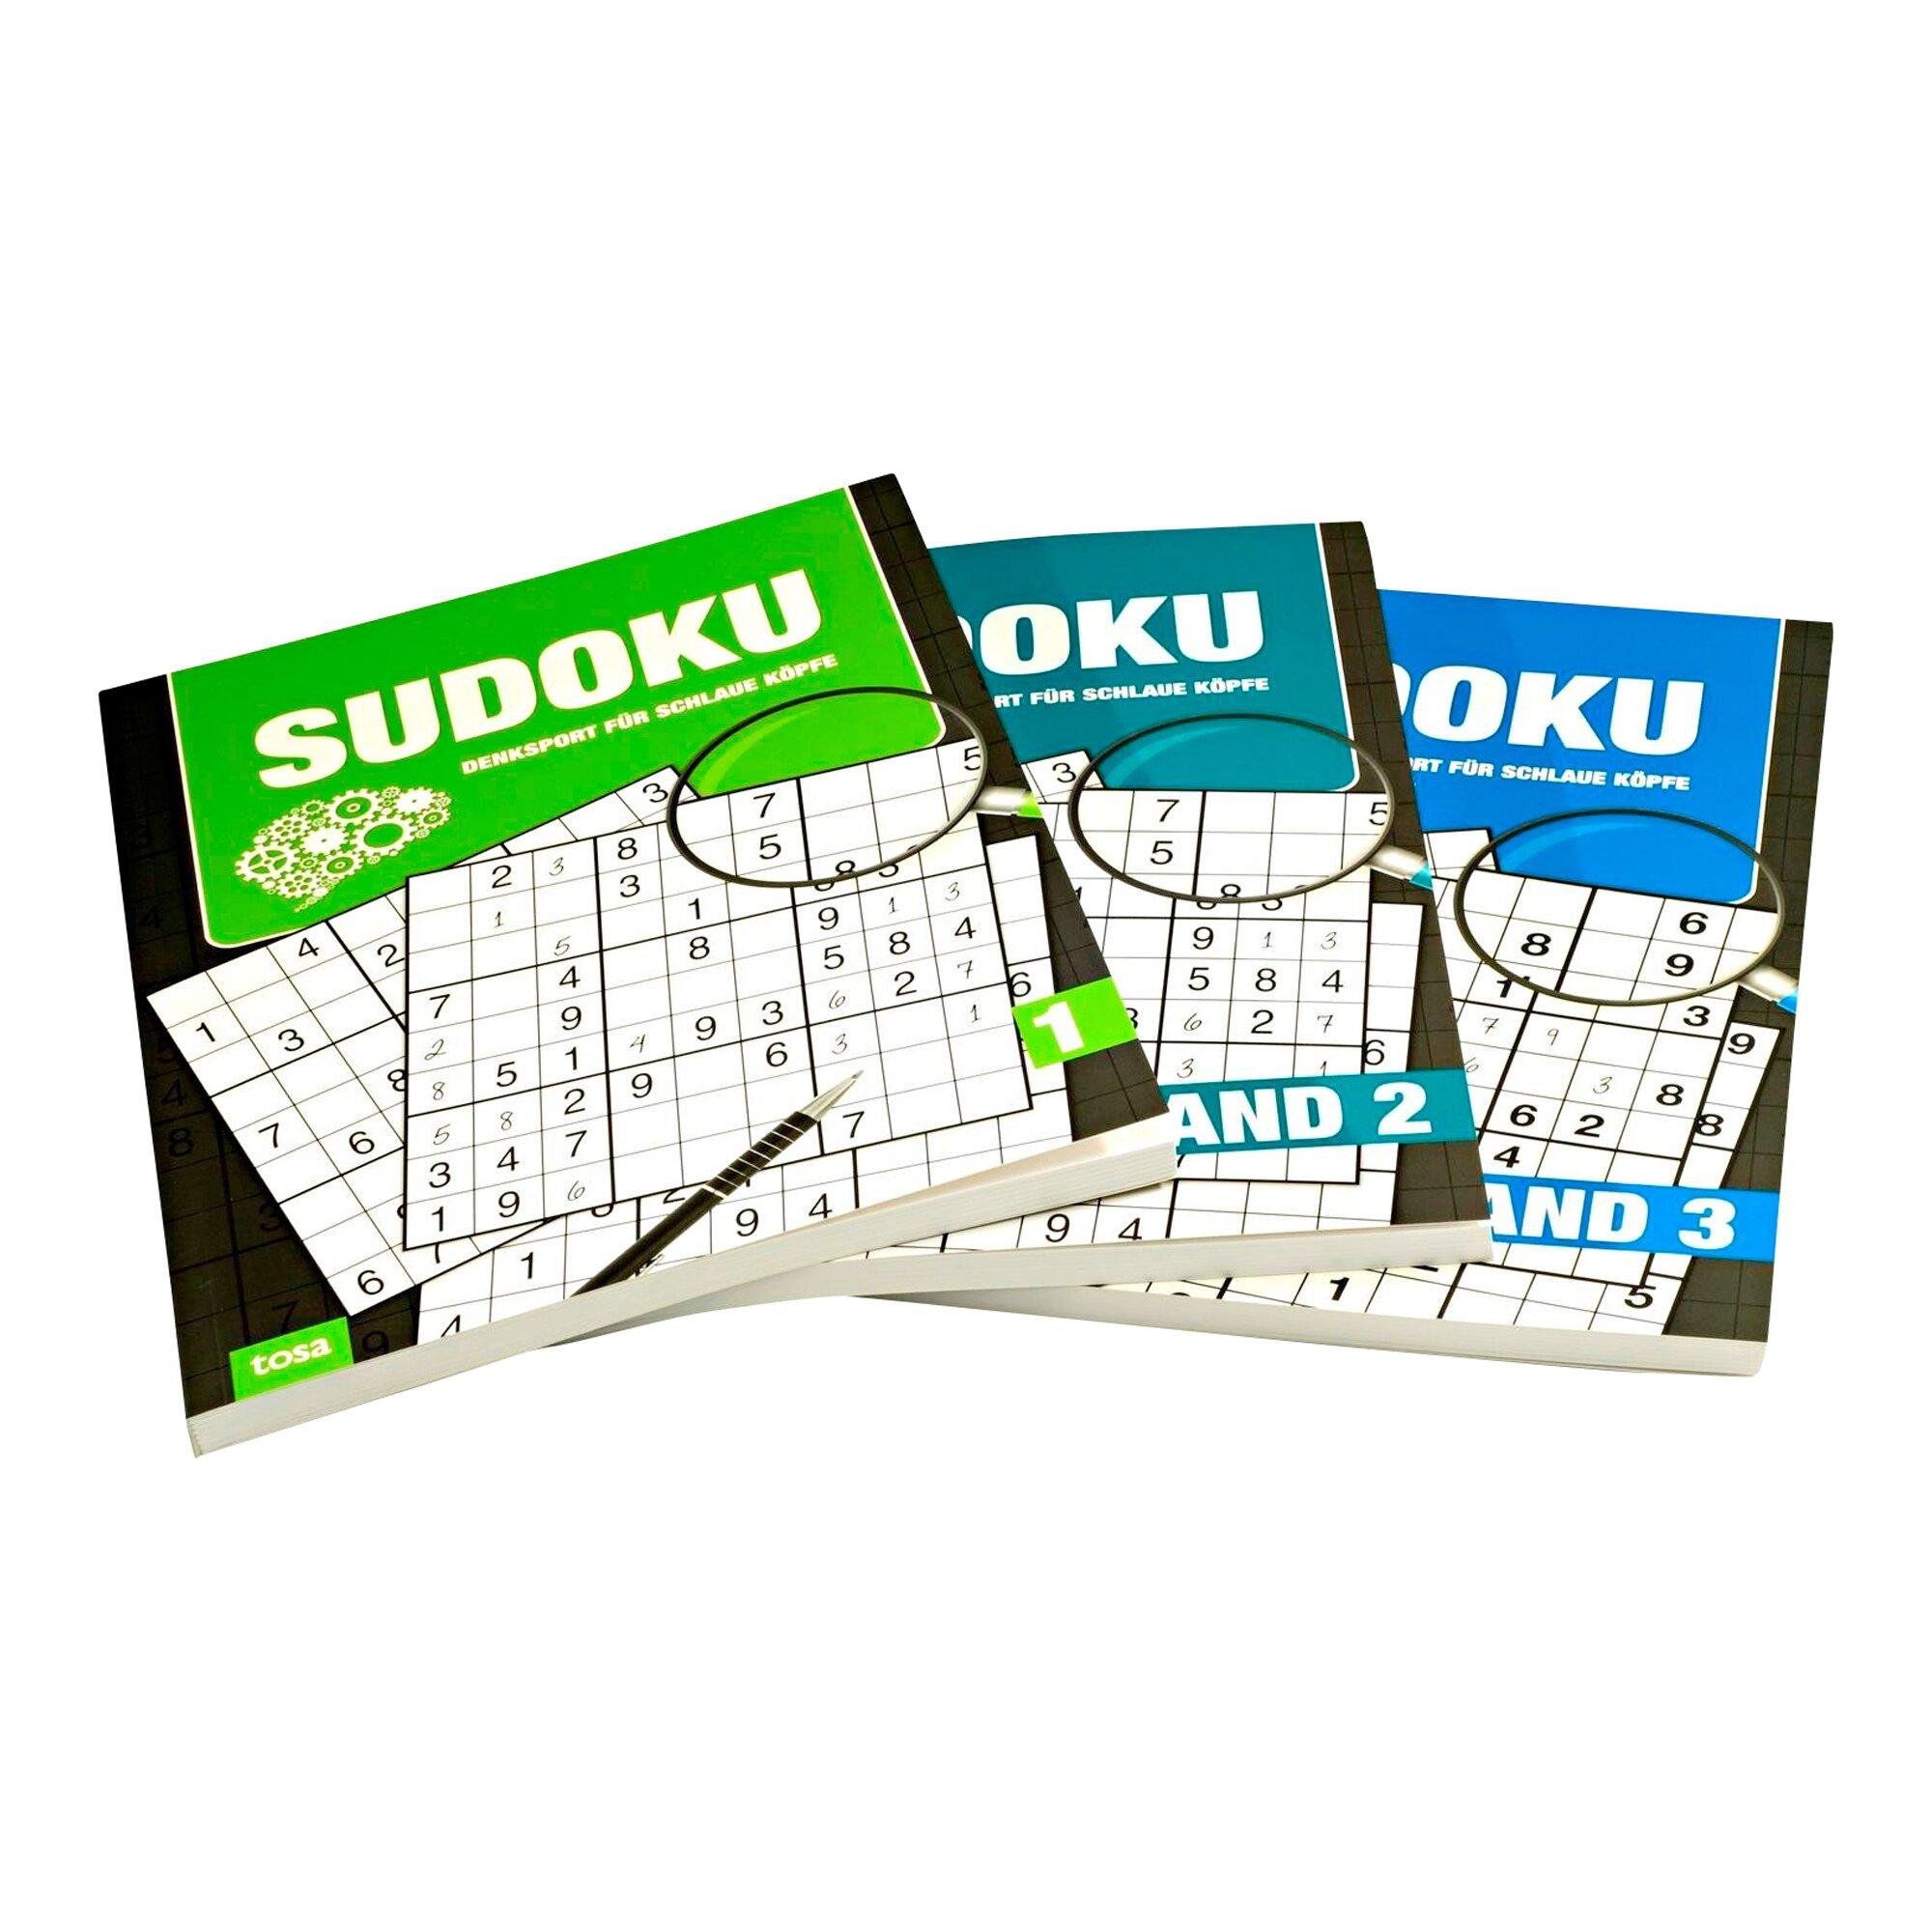 Image of Sudoku Großpack, 3 Bände